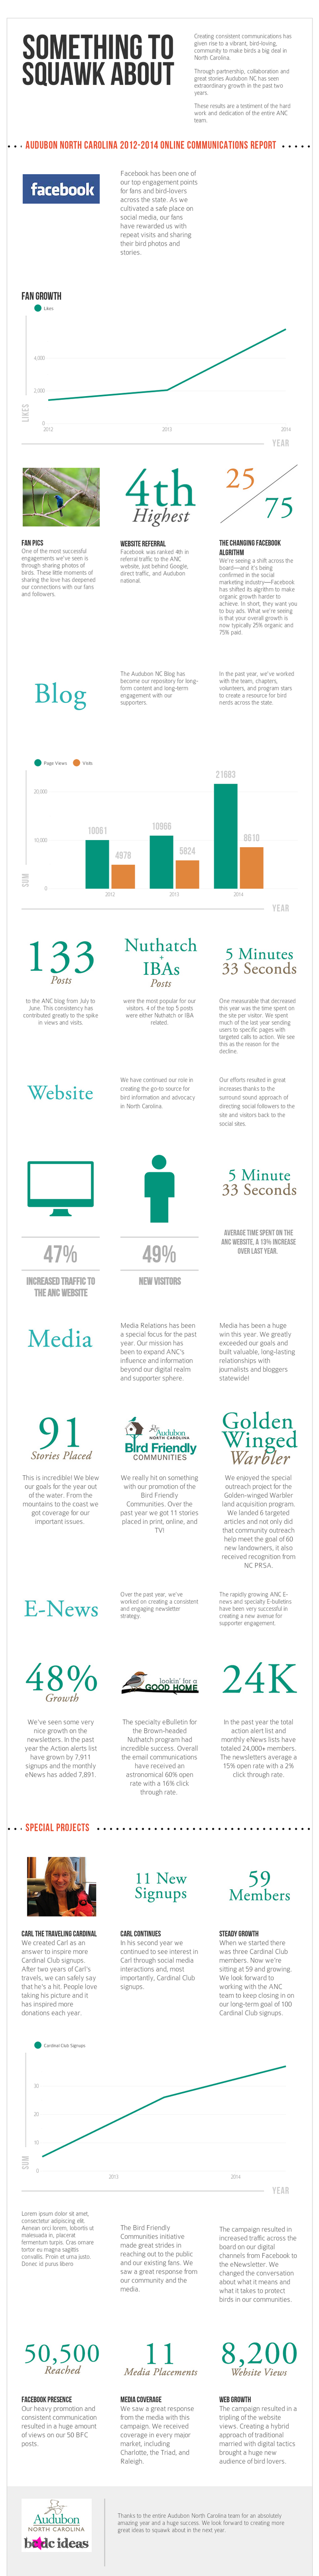 ANC 2012-2014 Infographic